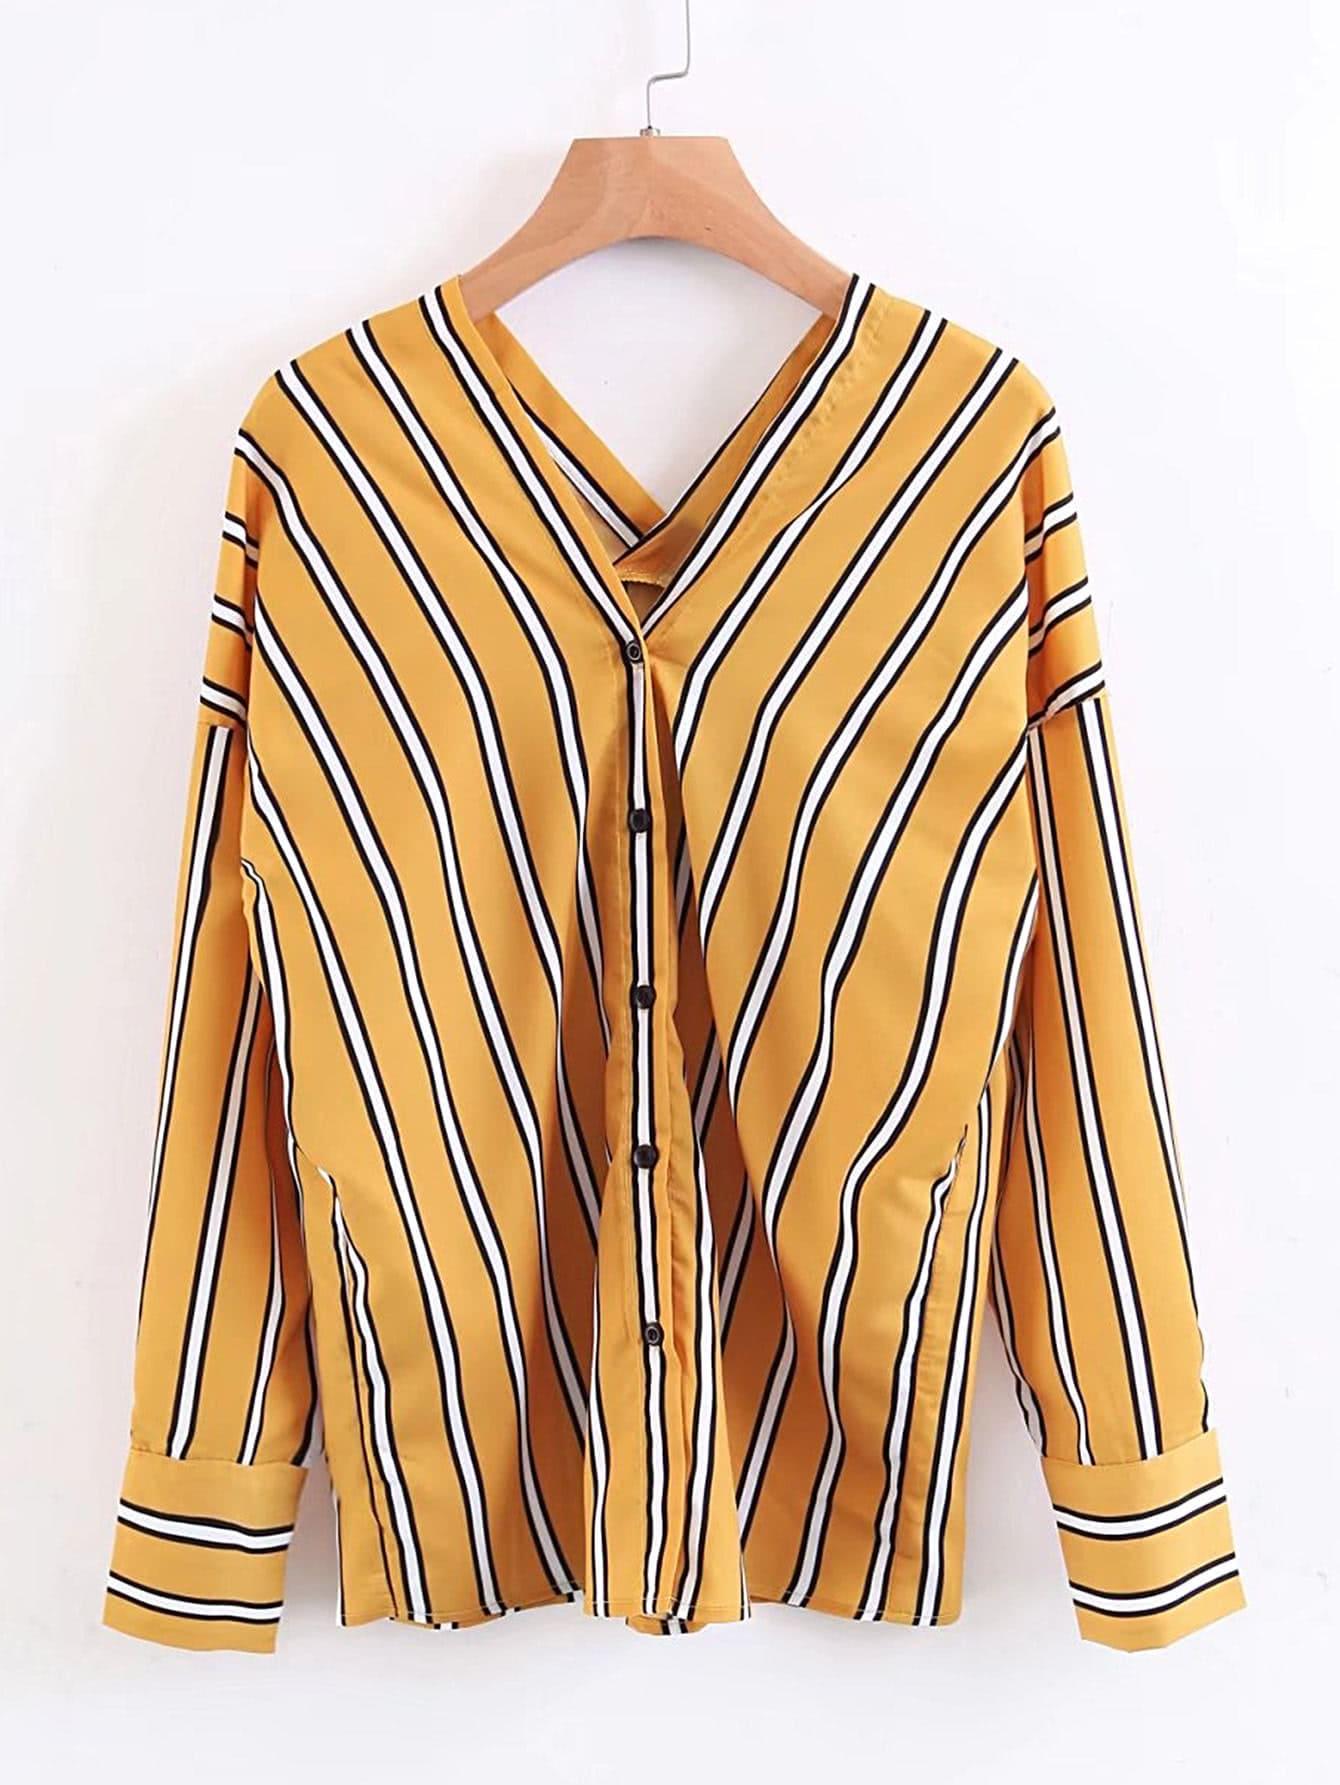 Double V Neck Vertical Striped Blouse blouse170811203